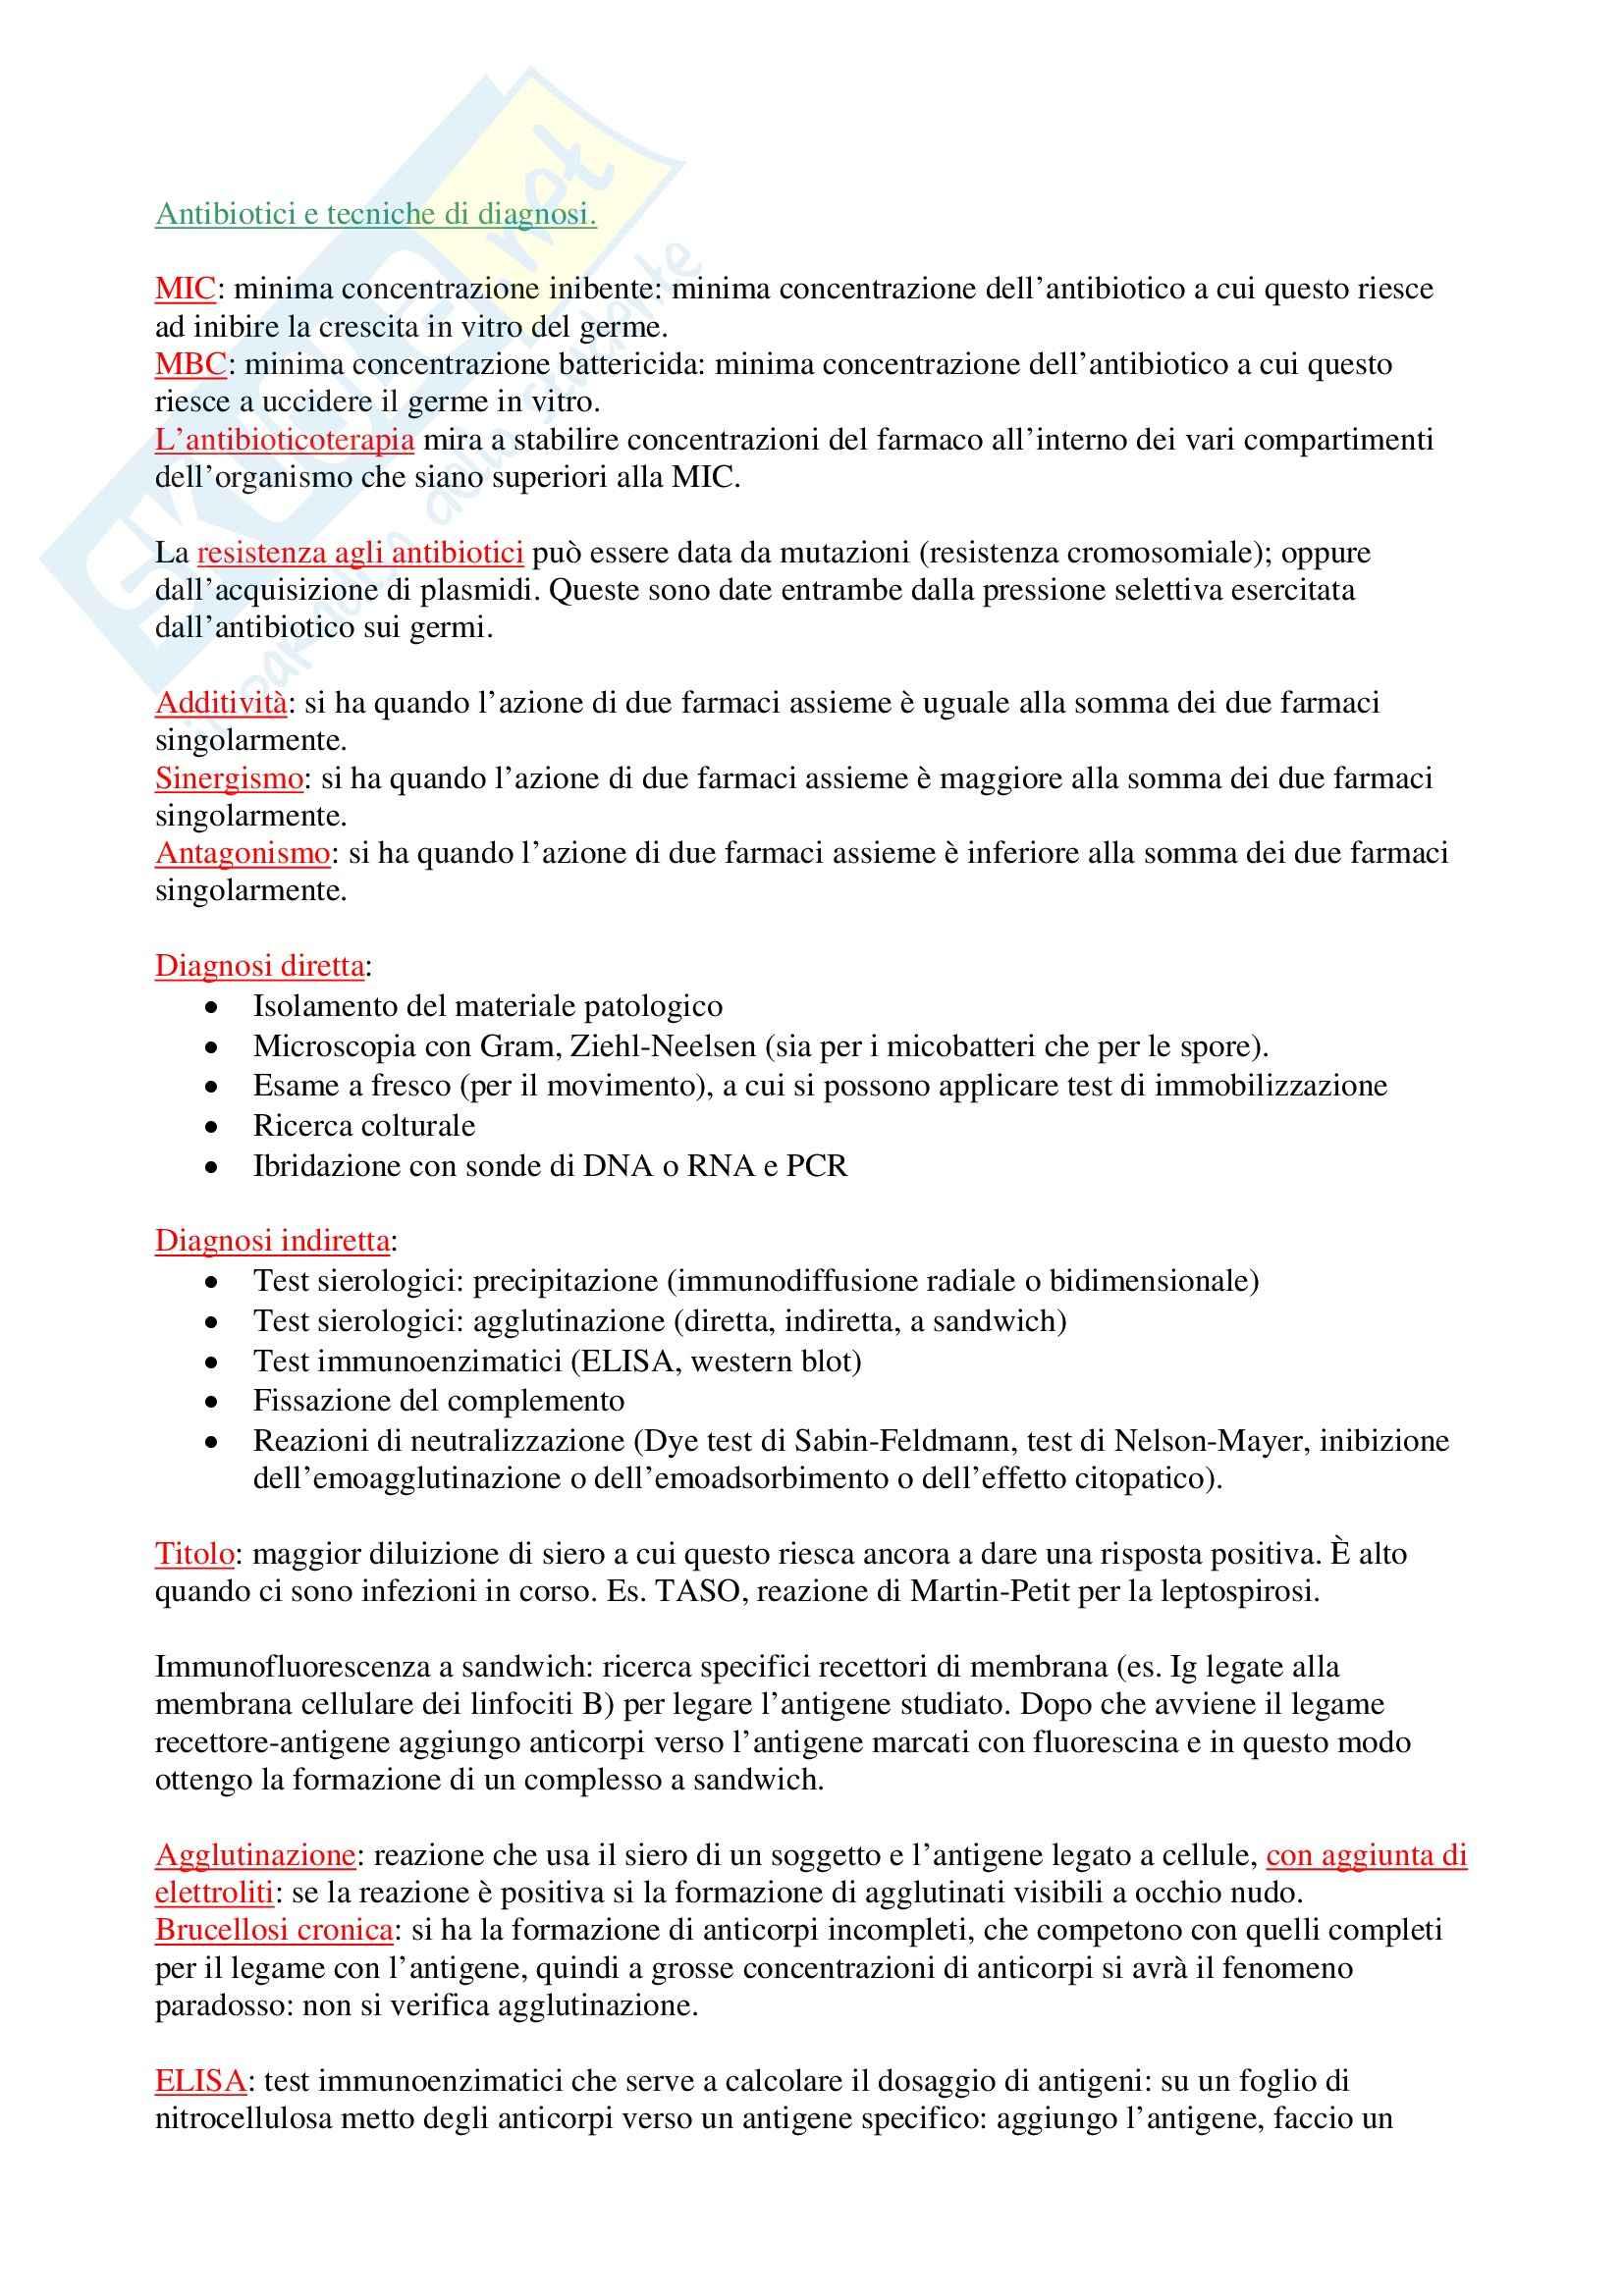 Microbiologia generale e lab. - nozioni generali